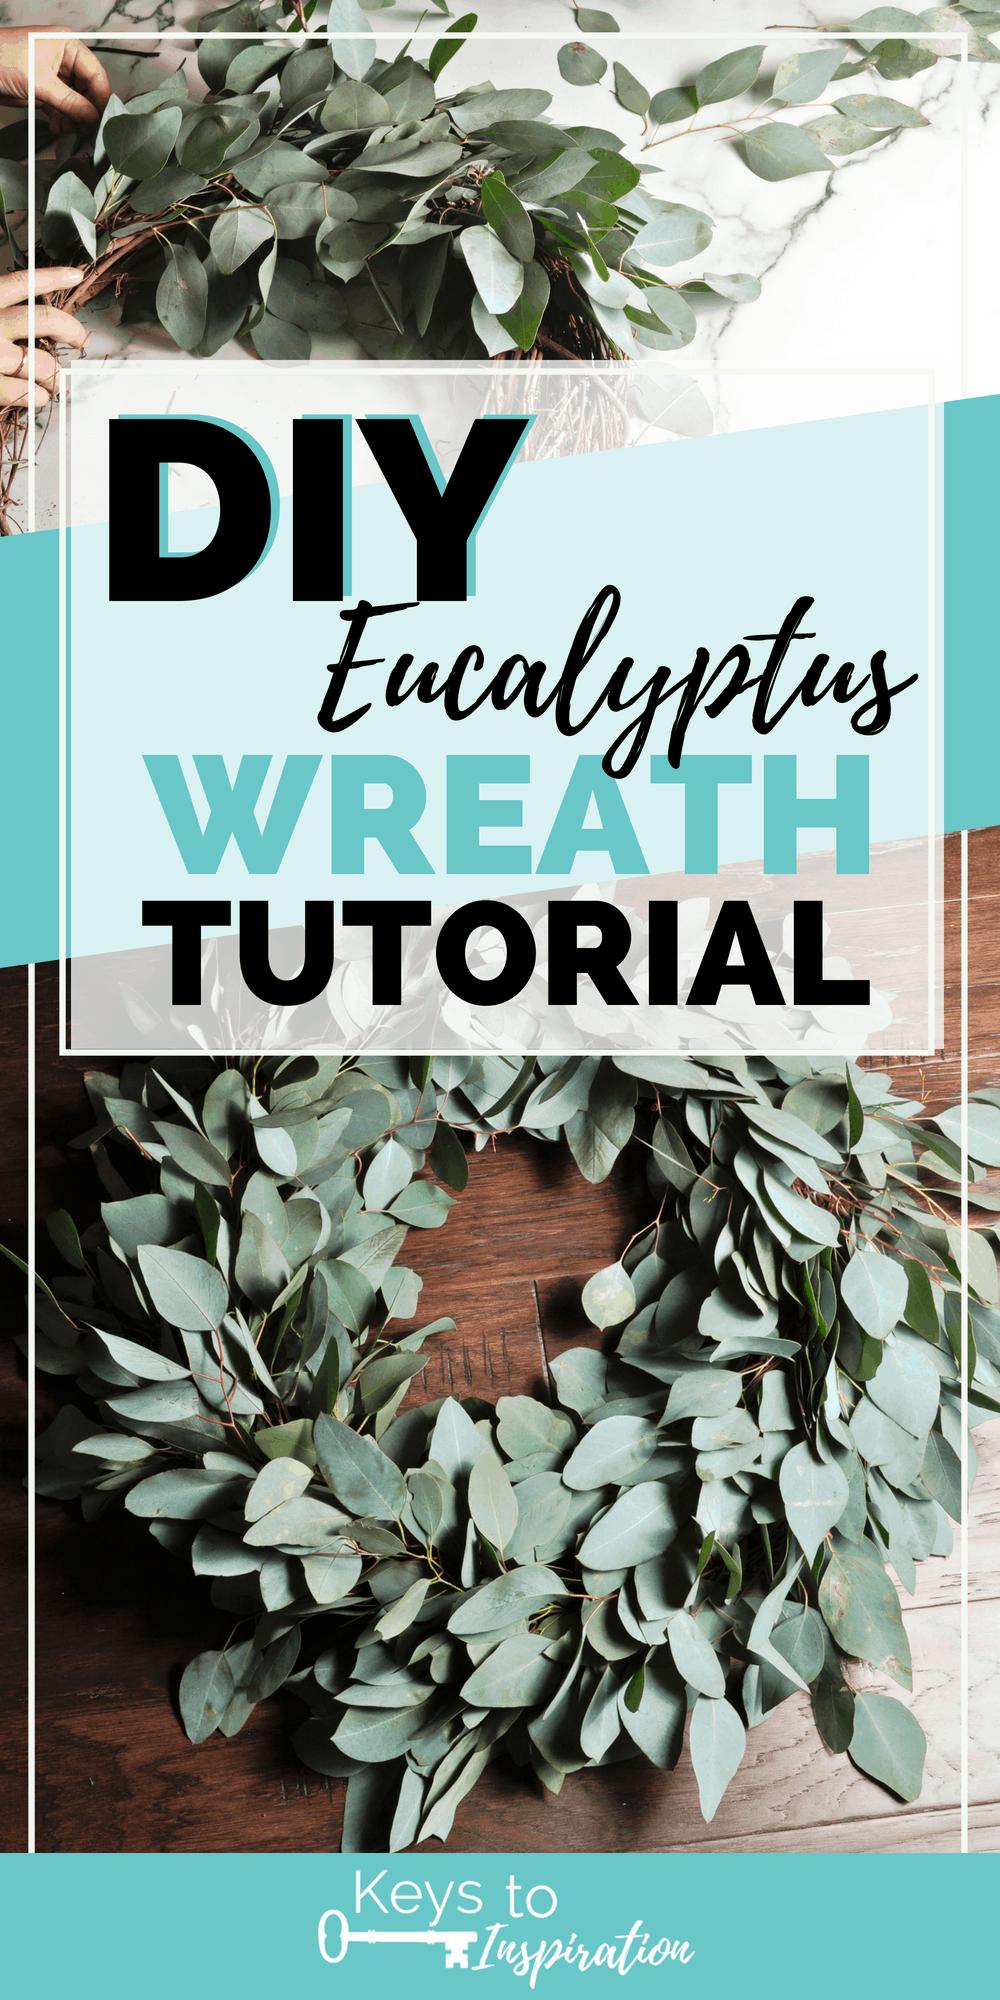 Eucalyptus wreath making